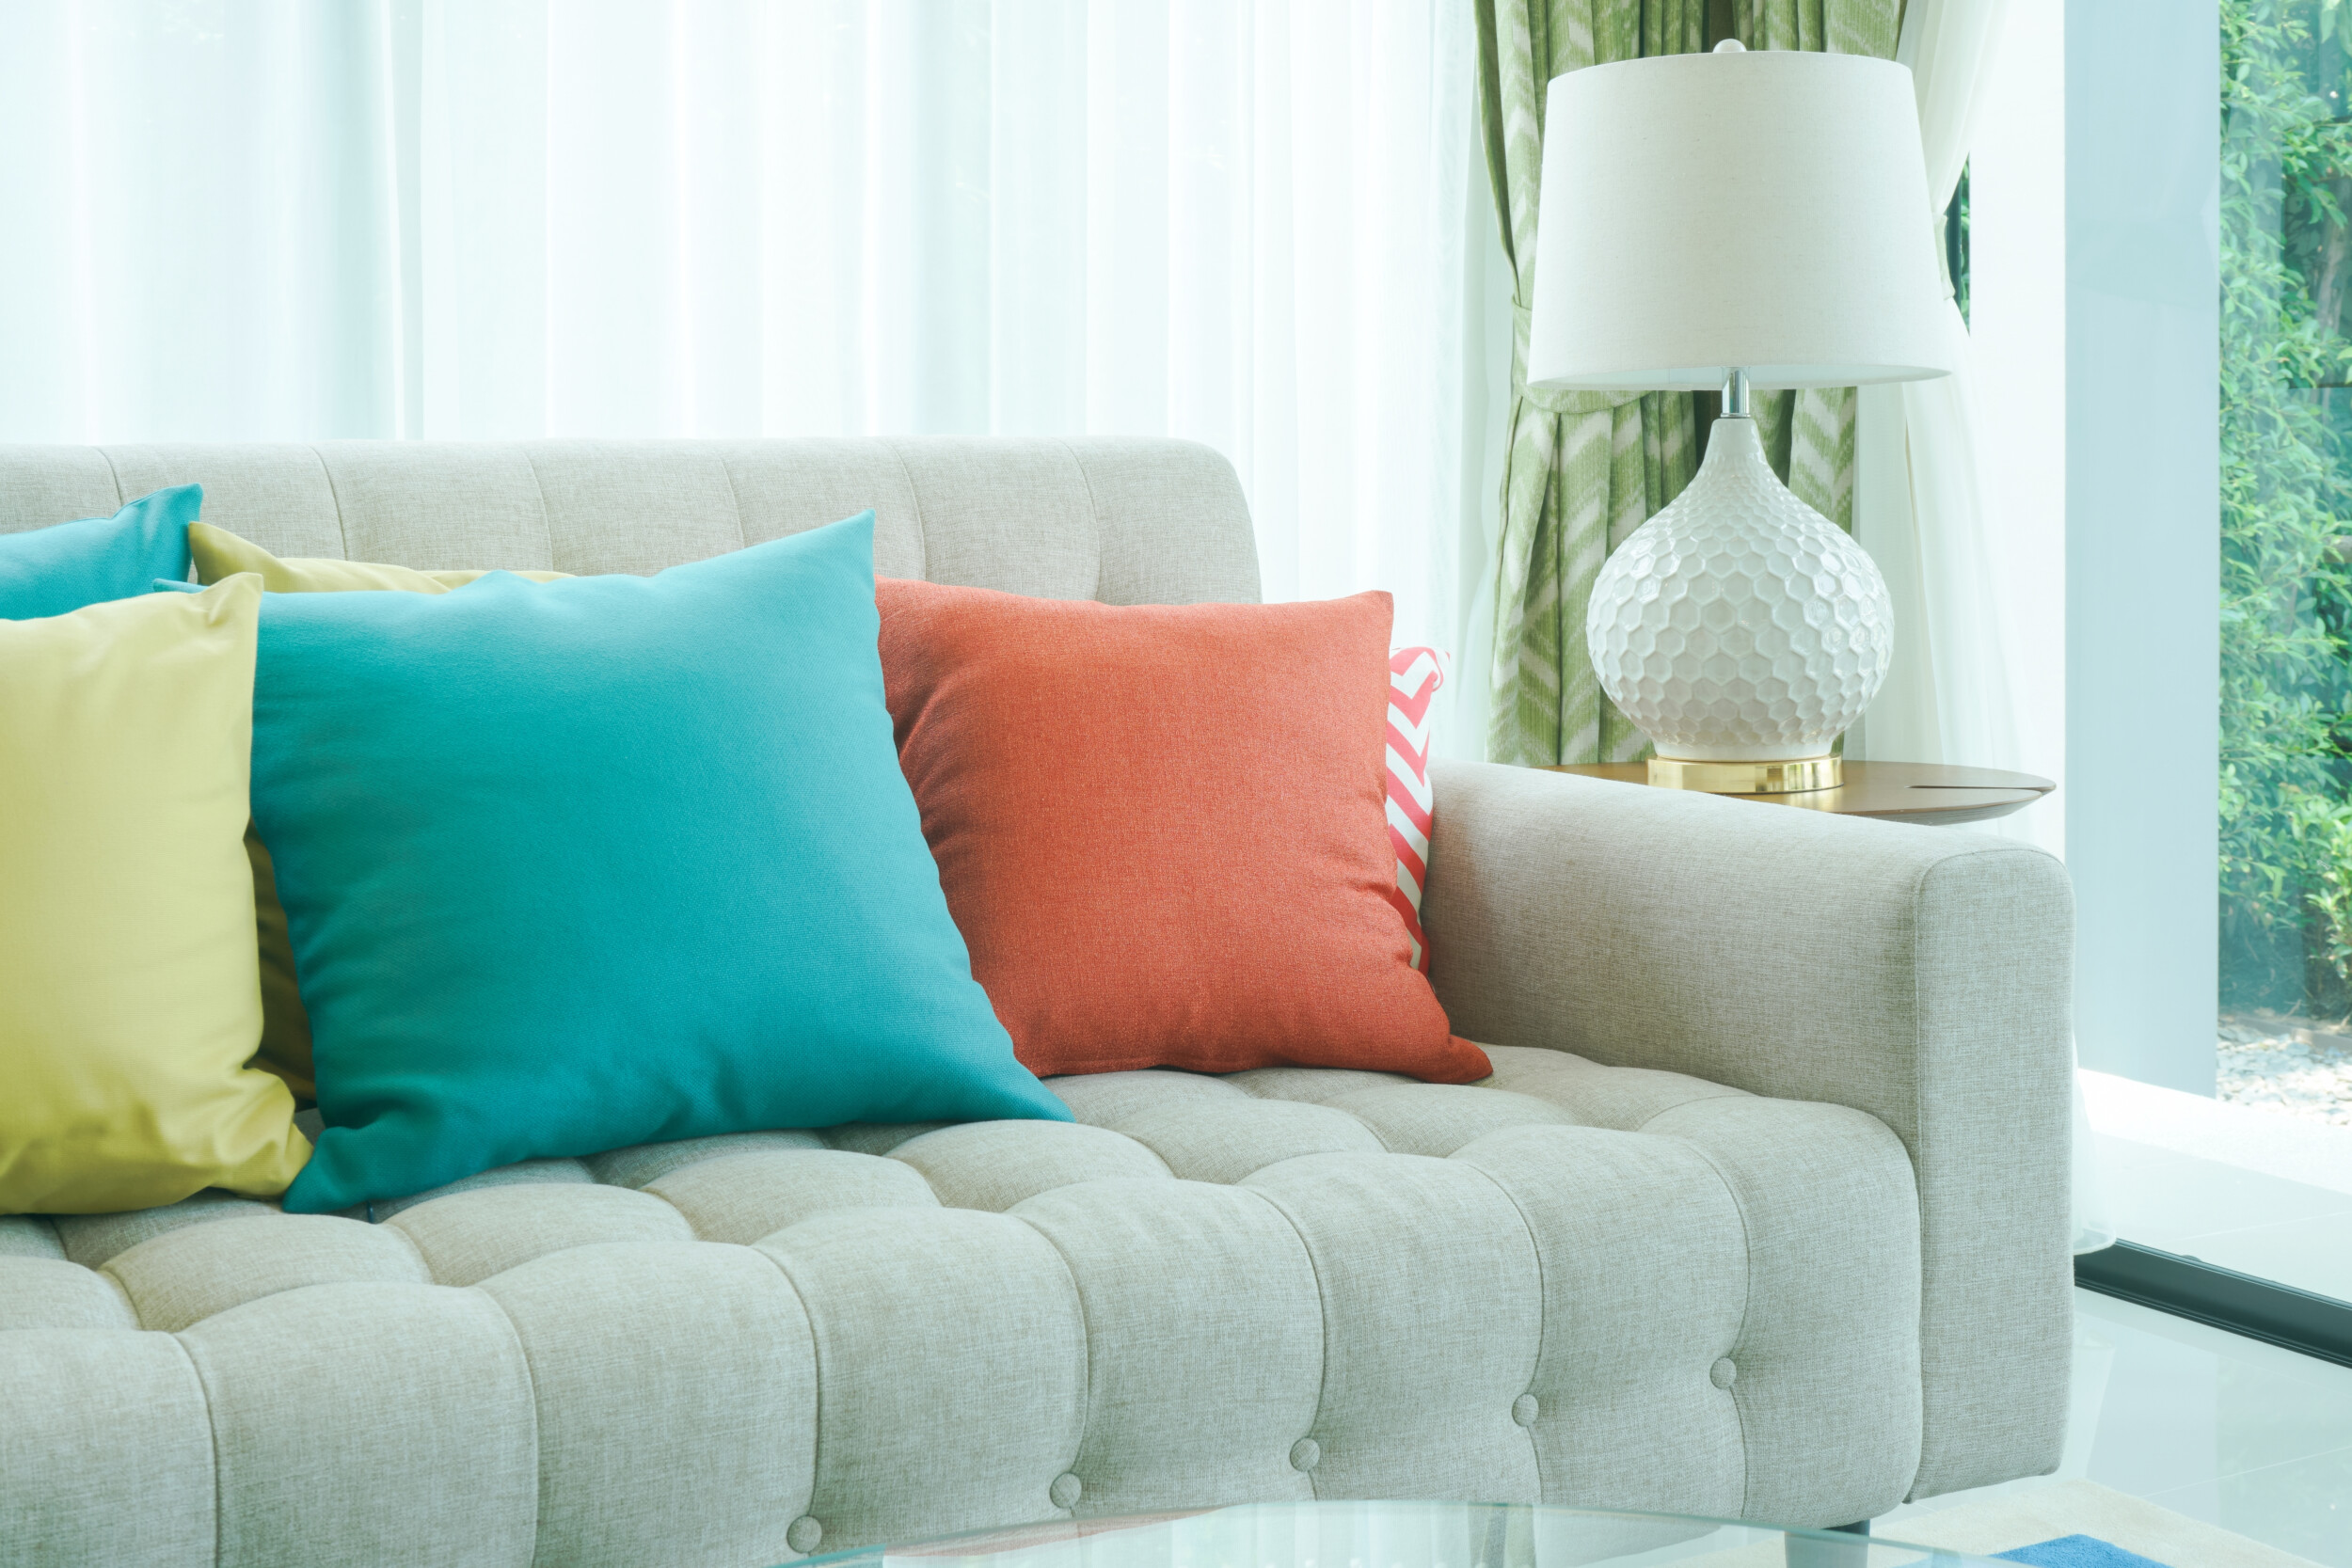 colorful pillows sofa living room